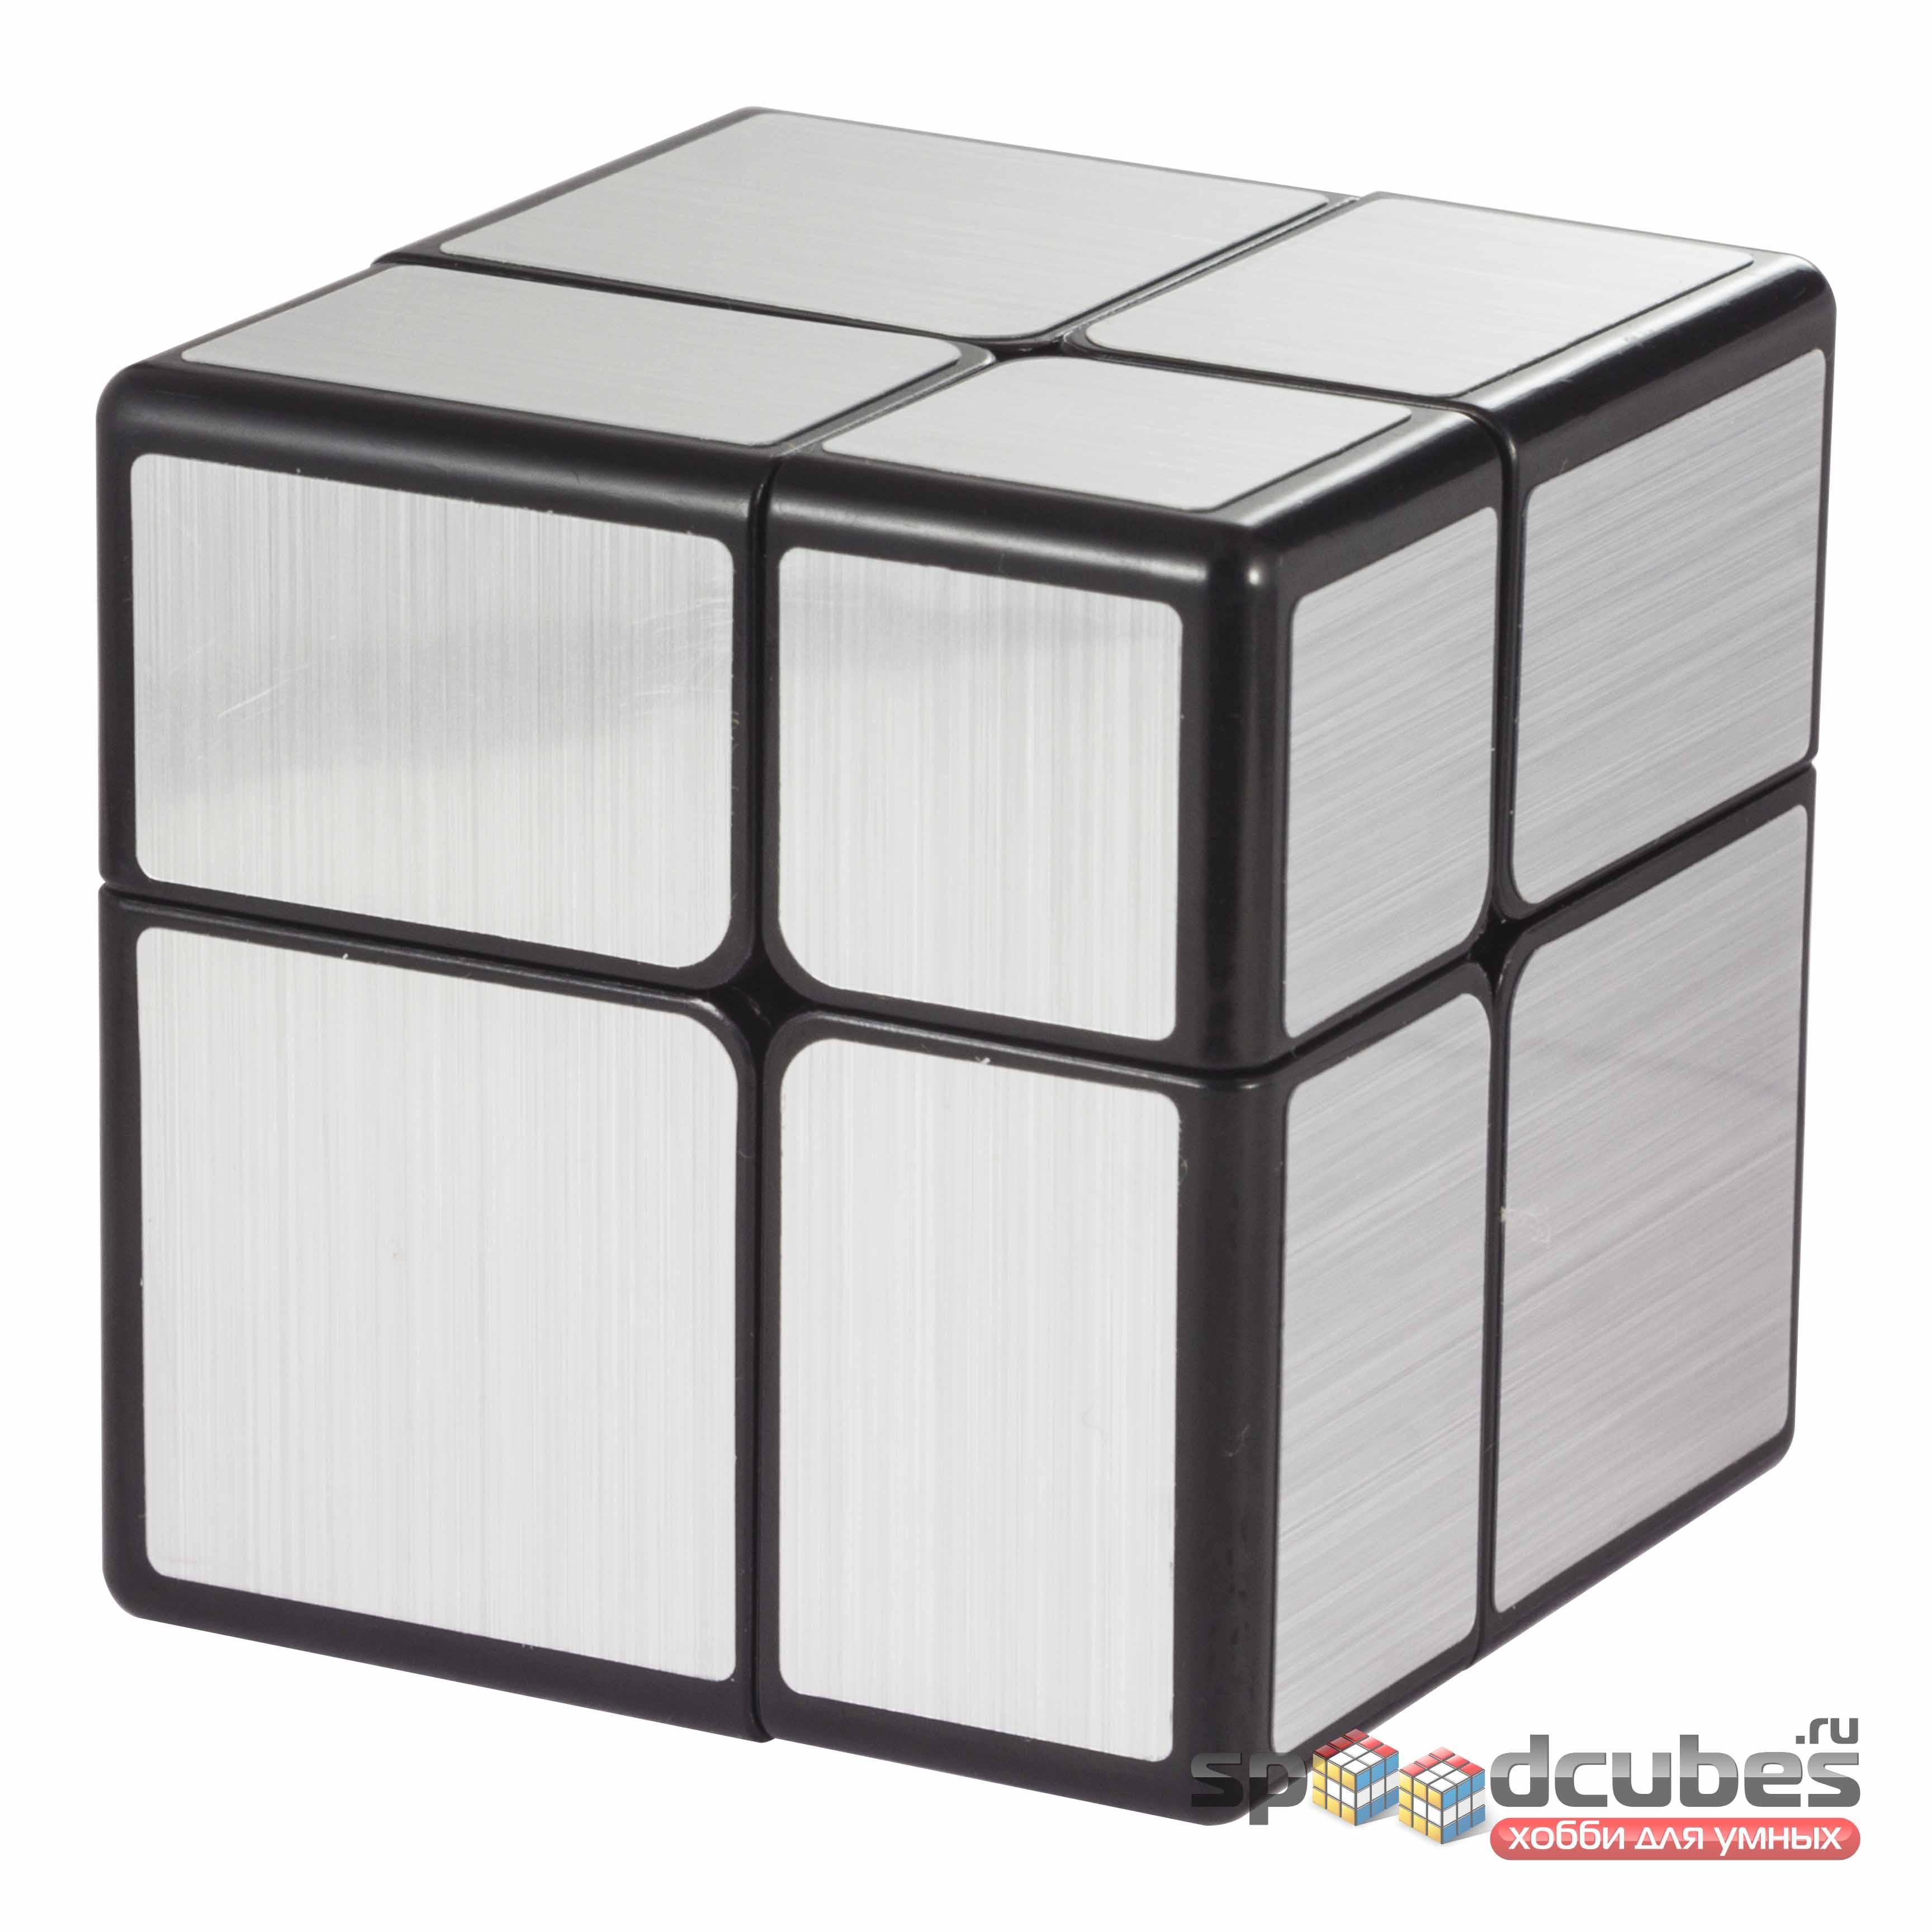 QiYi (MoFangGe) 2x2 Mirror Cube 2